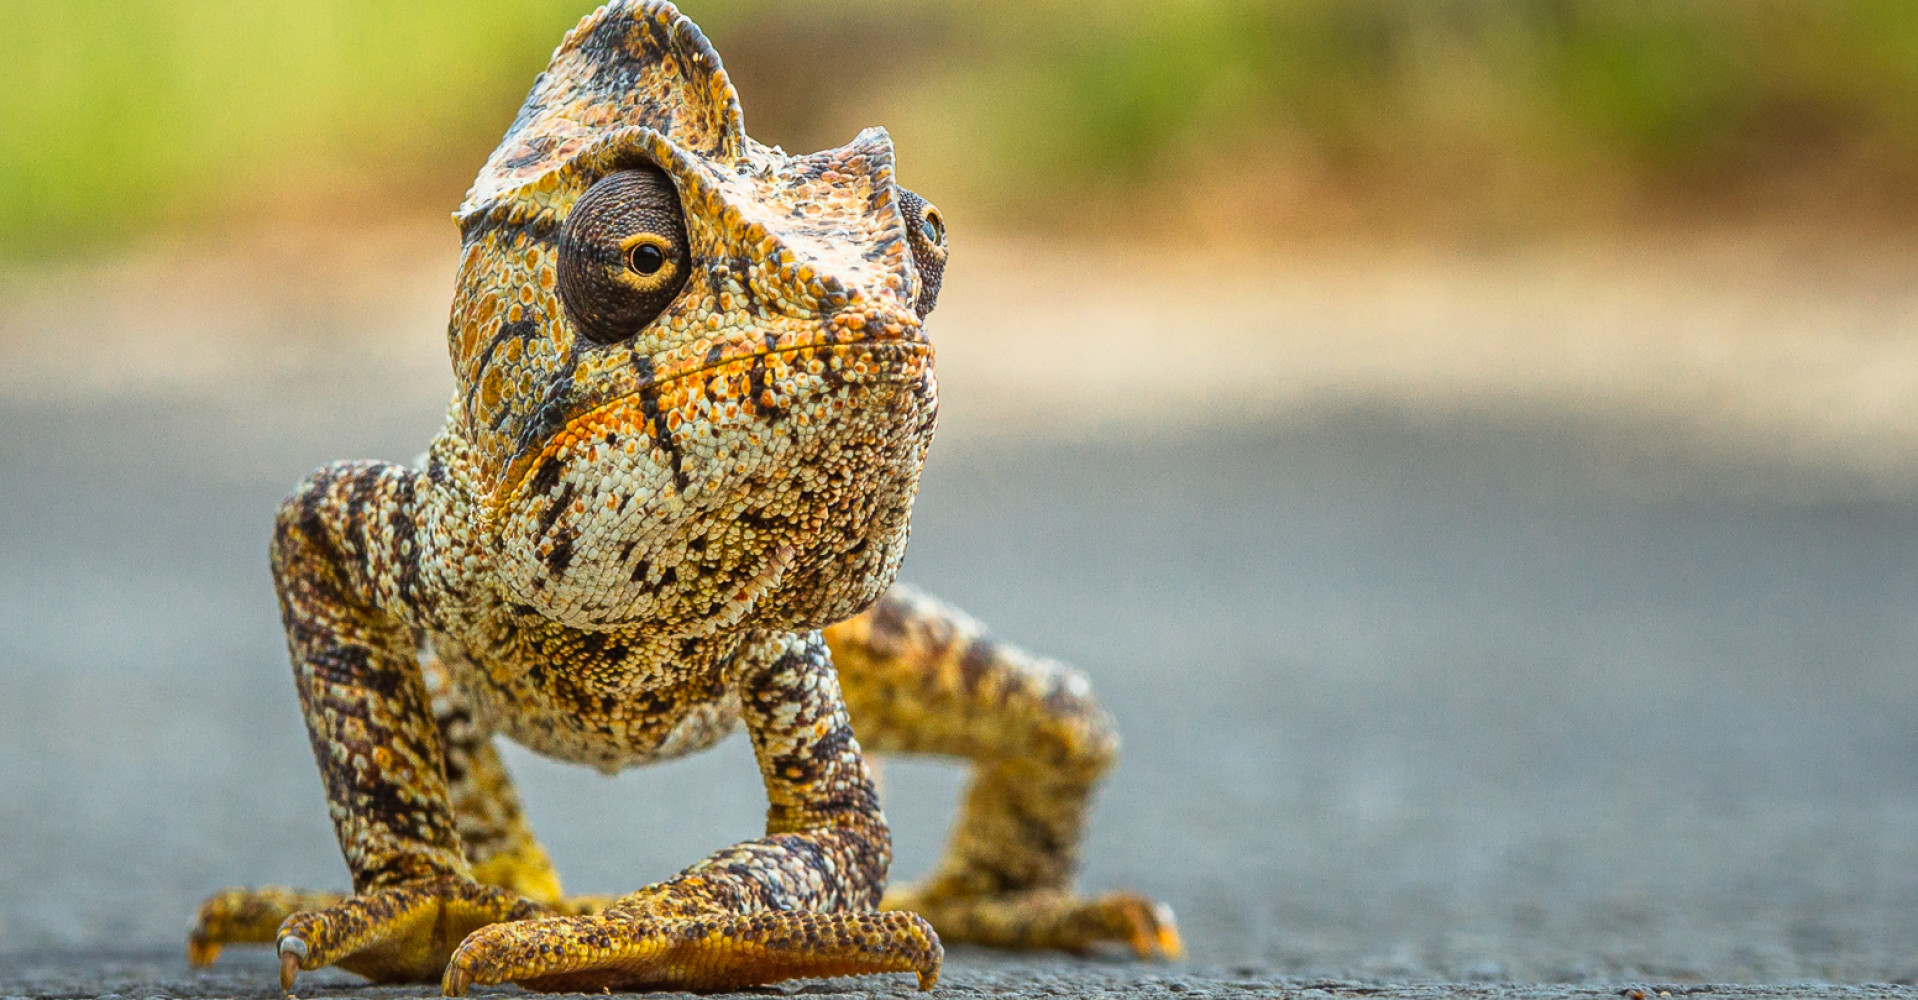 Award-winning chameleon photo captured in Madagascar